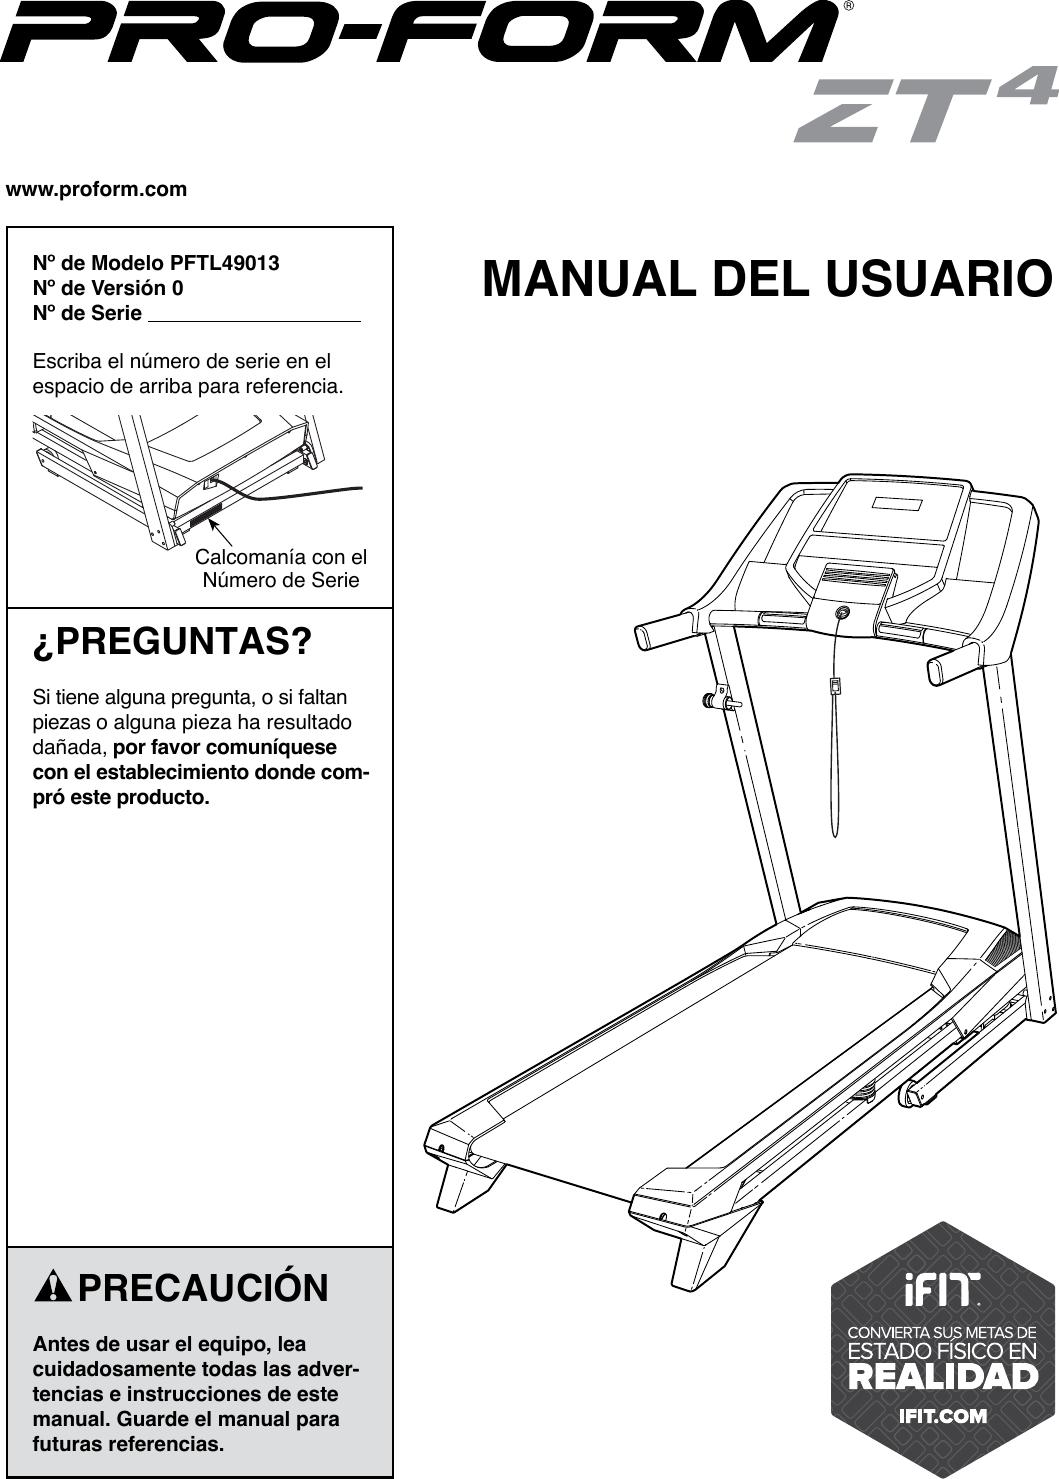 Diagram Treadmill Wiring Proform Pftl39513 1 Electrical Pftl490130 Zt4 Users Manual